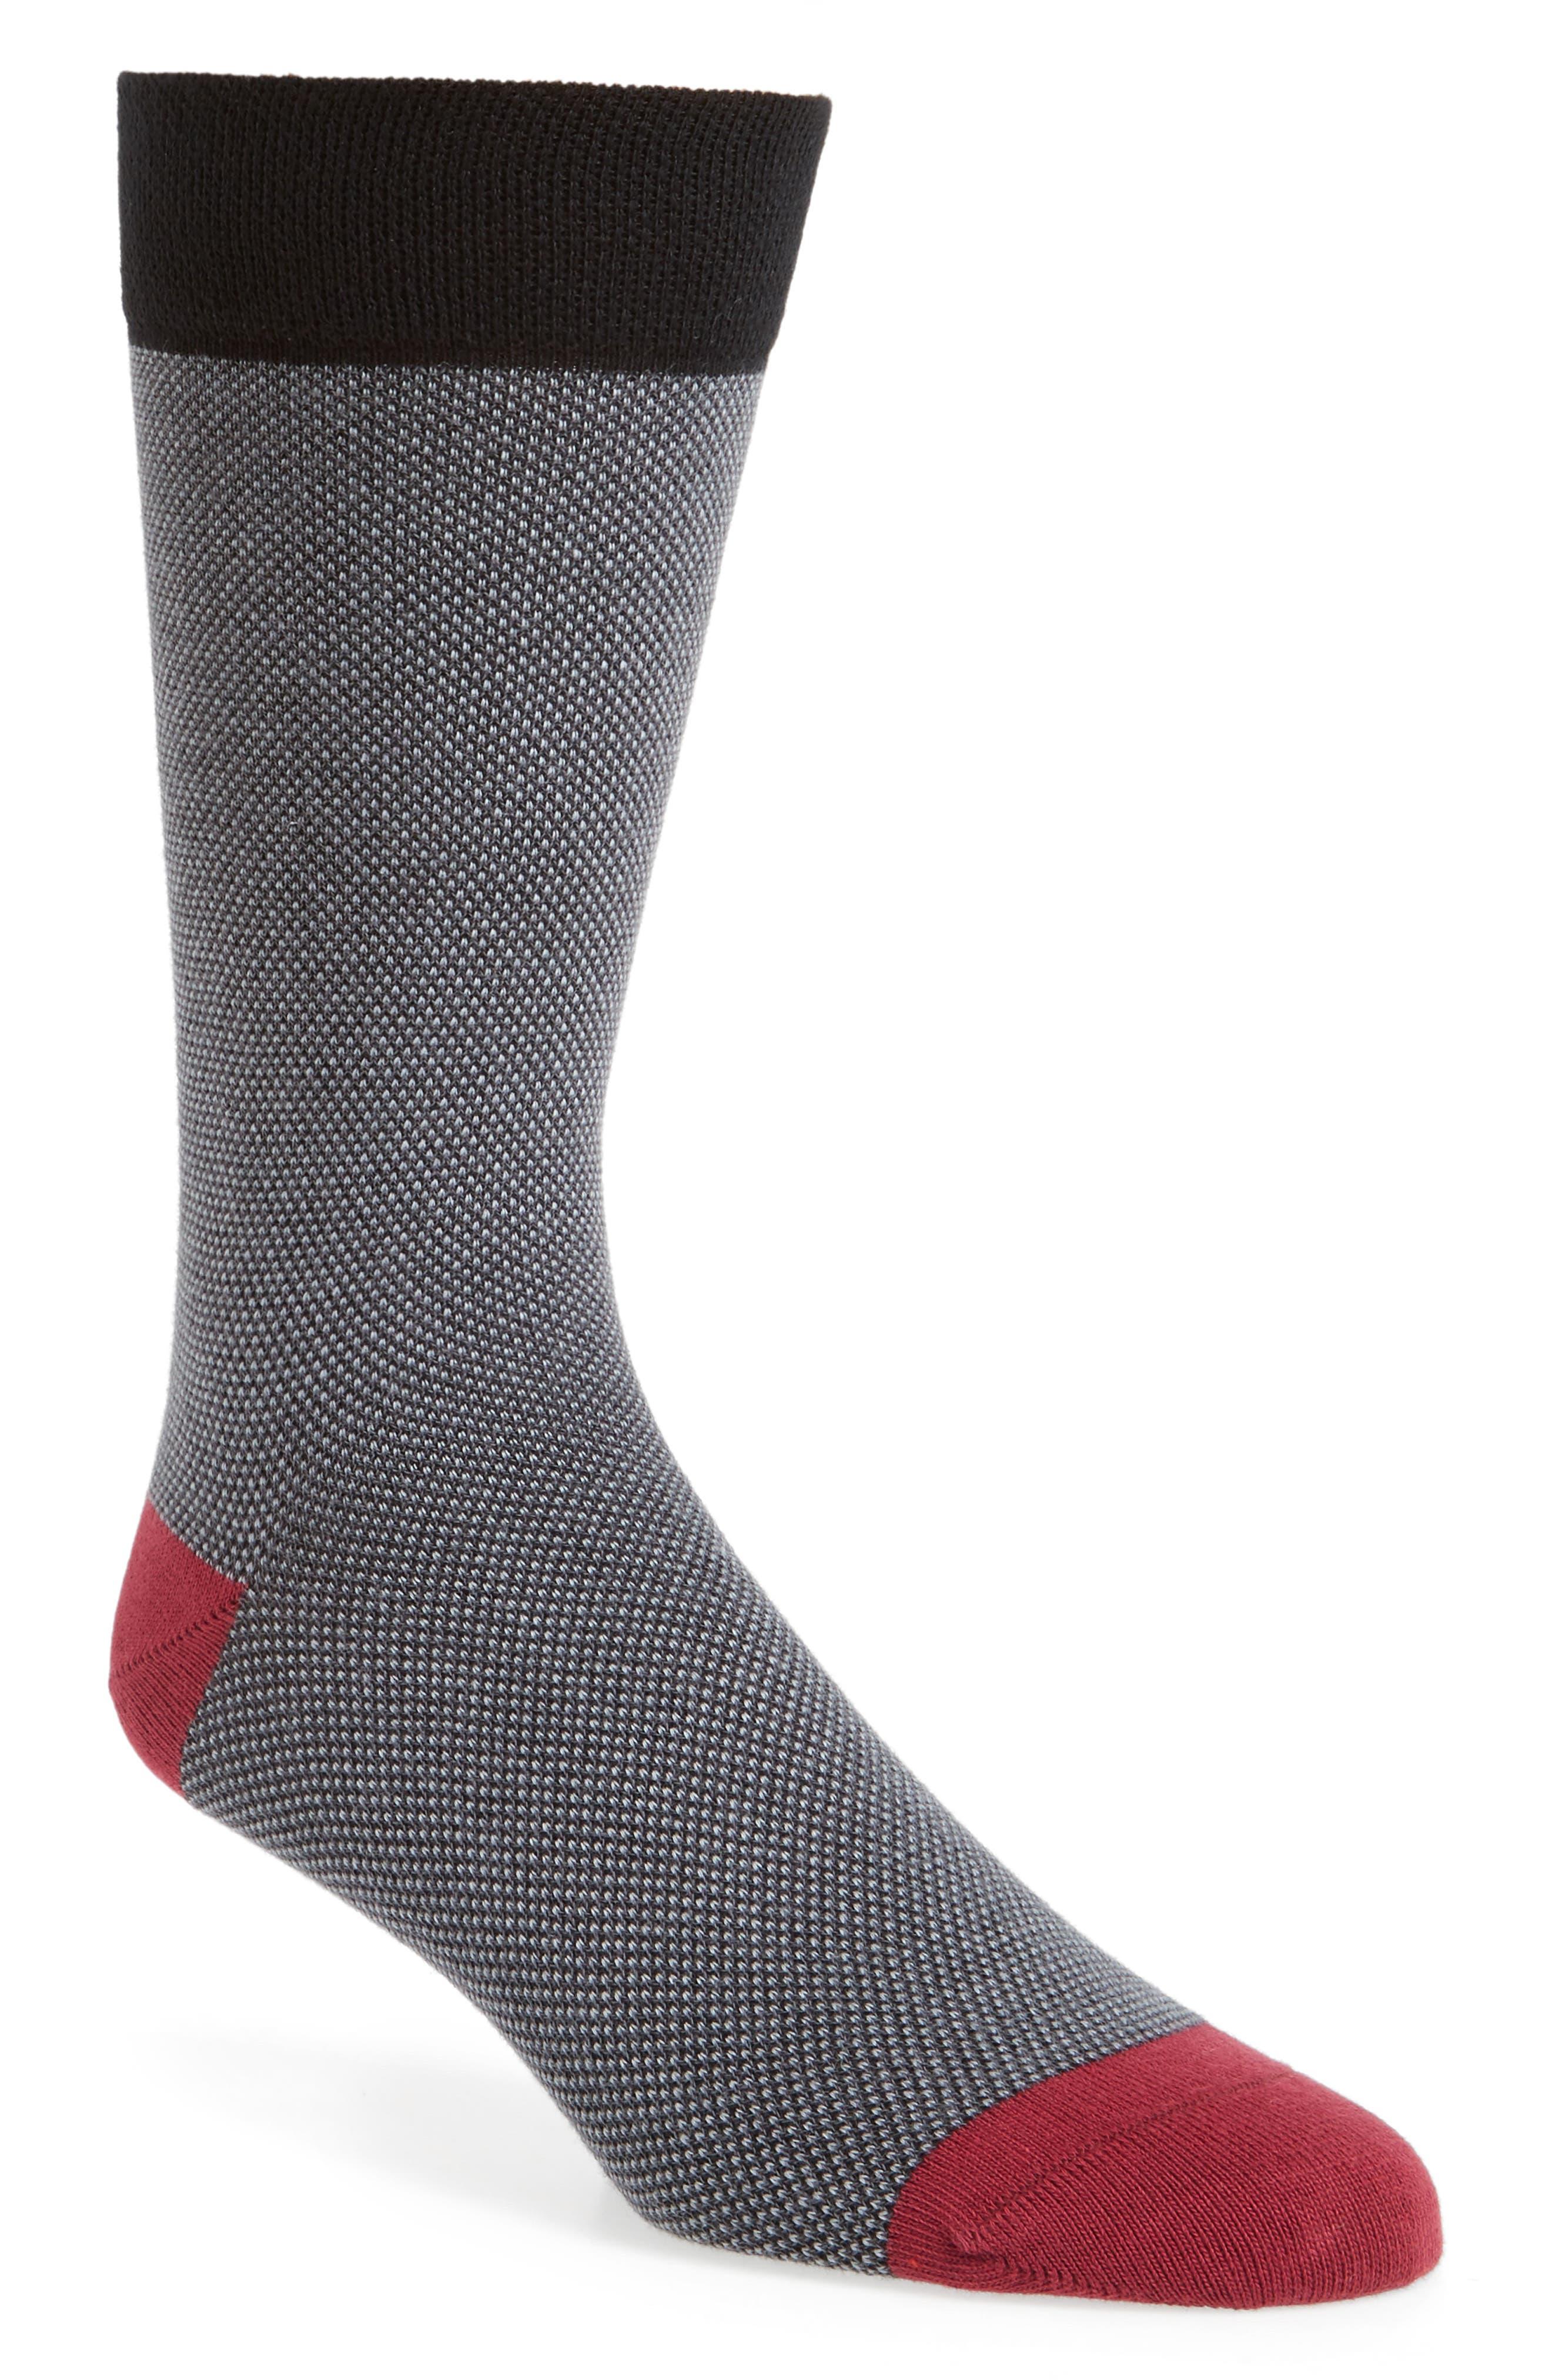 TED BAKER LONDON Joaquim Solid Socks, Main, color, BLACK/ CHARCOAL